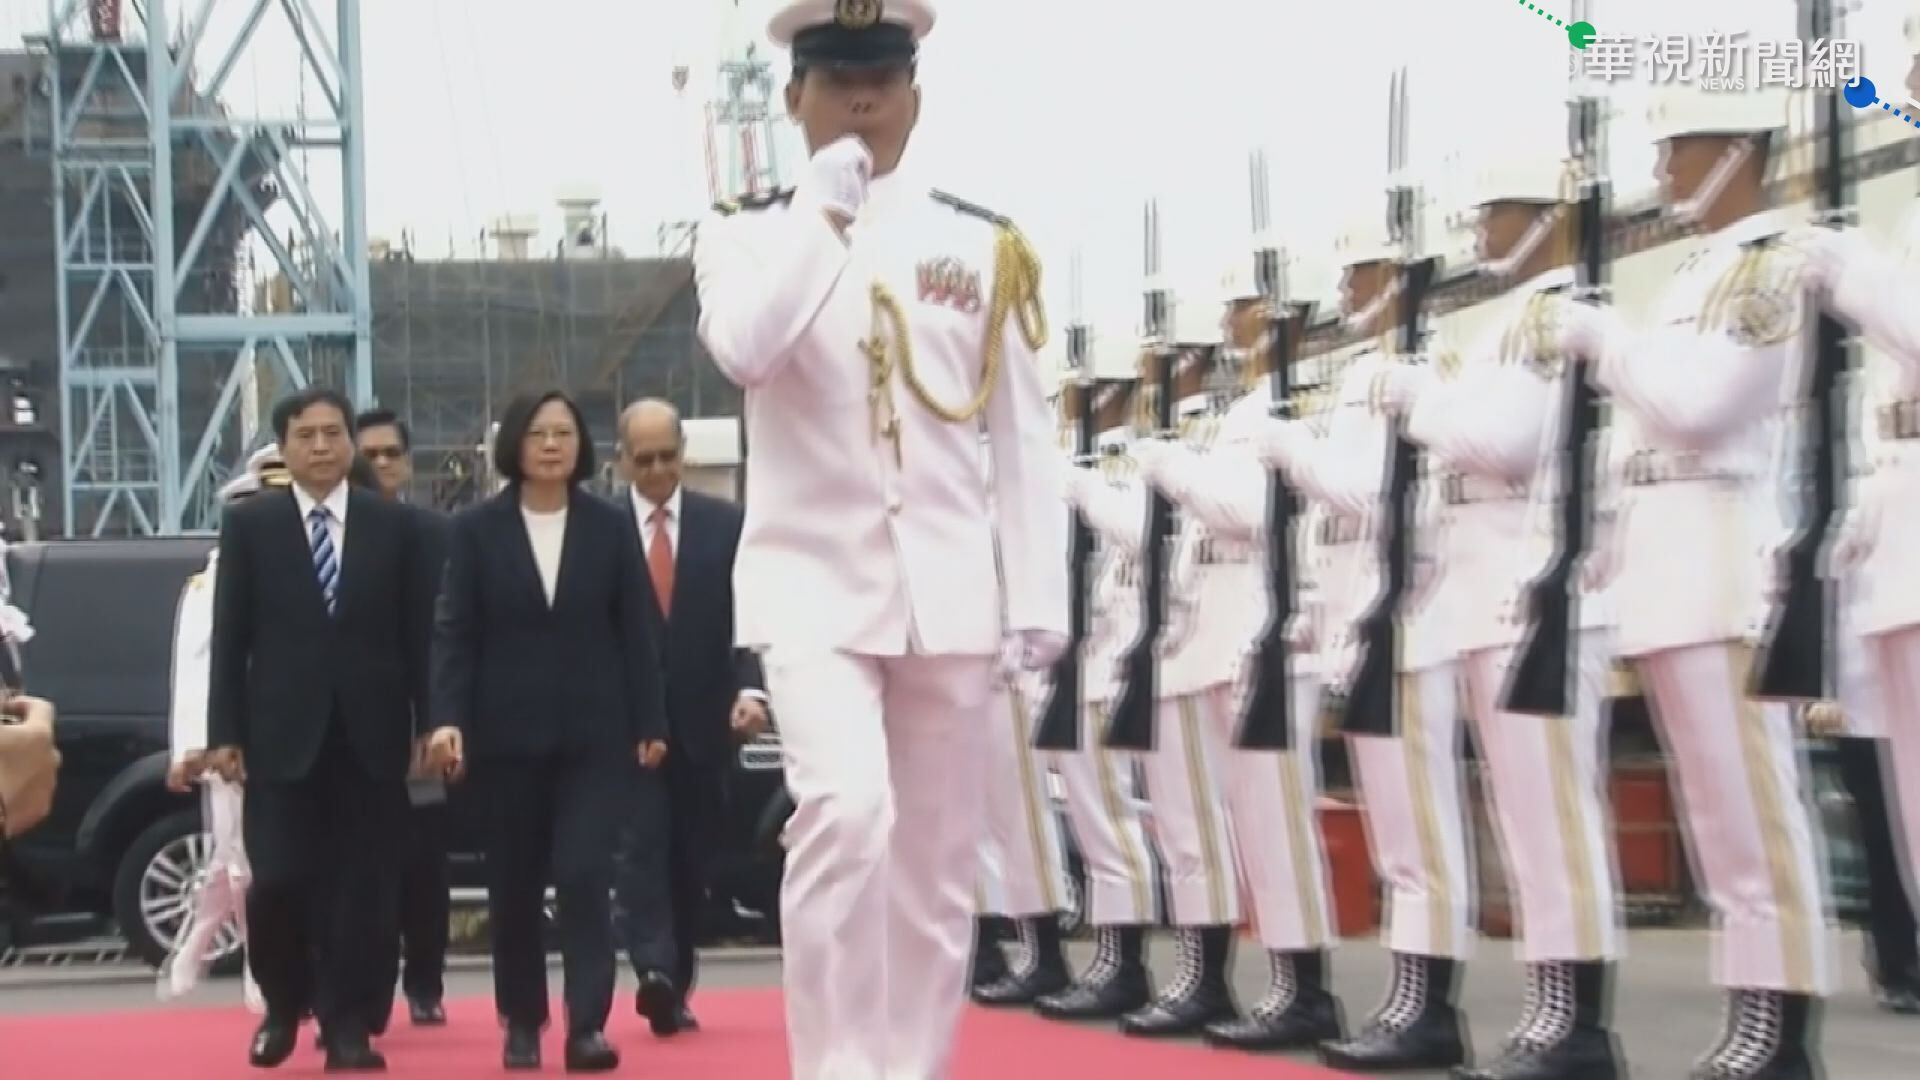 CH-47國慶吊掛最大國旗 試飛畫面曝